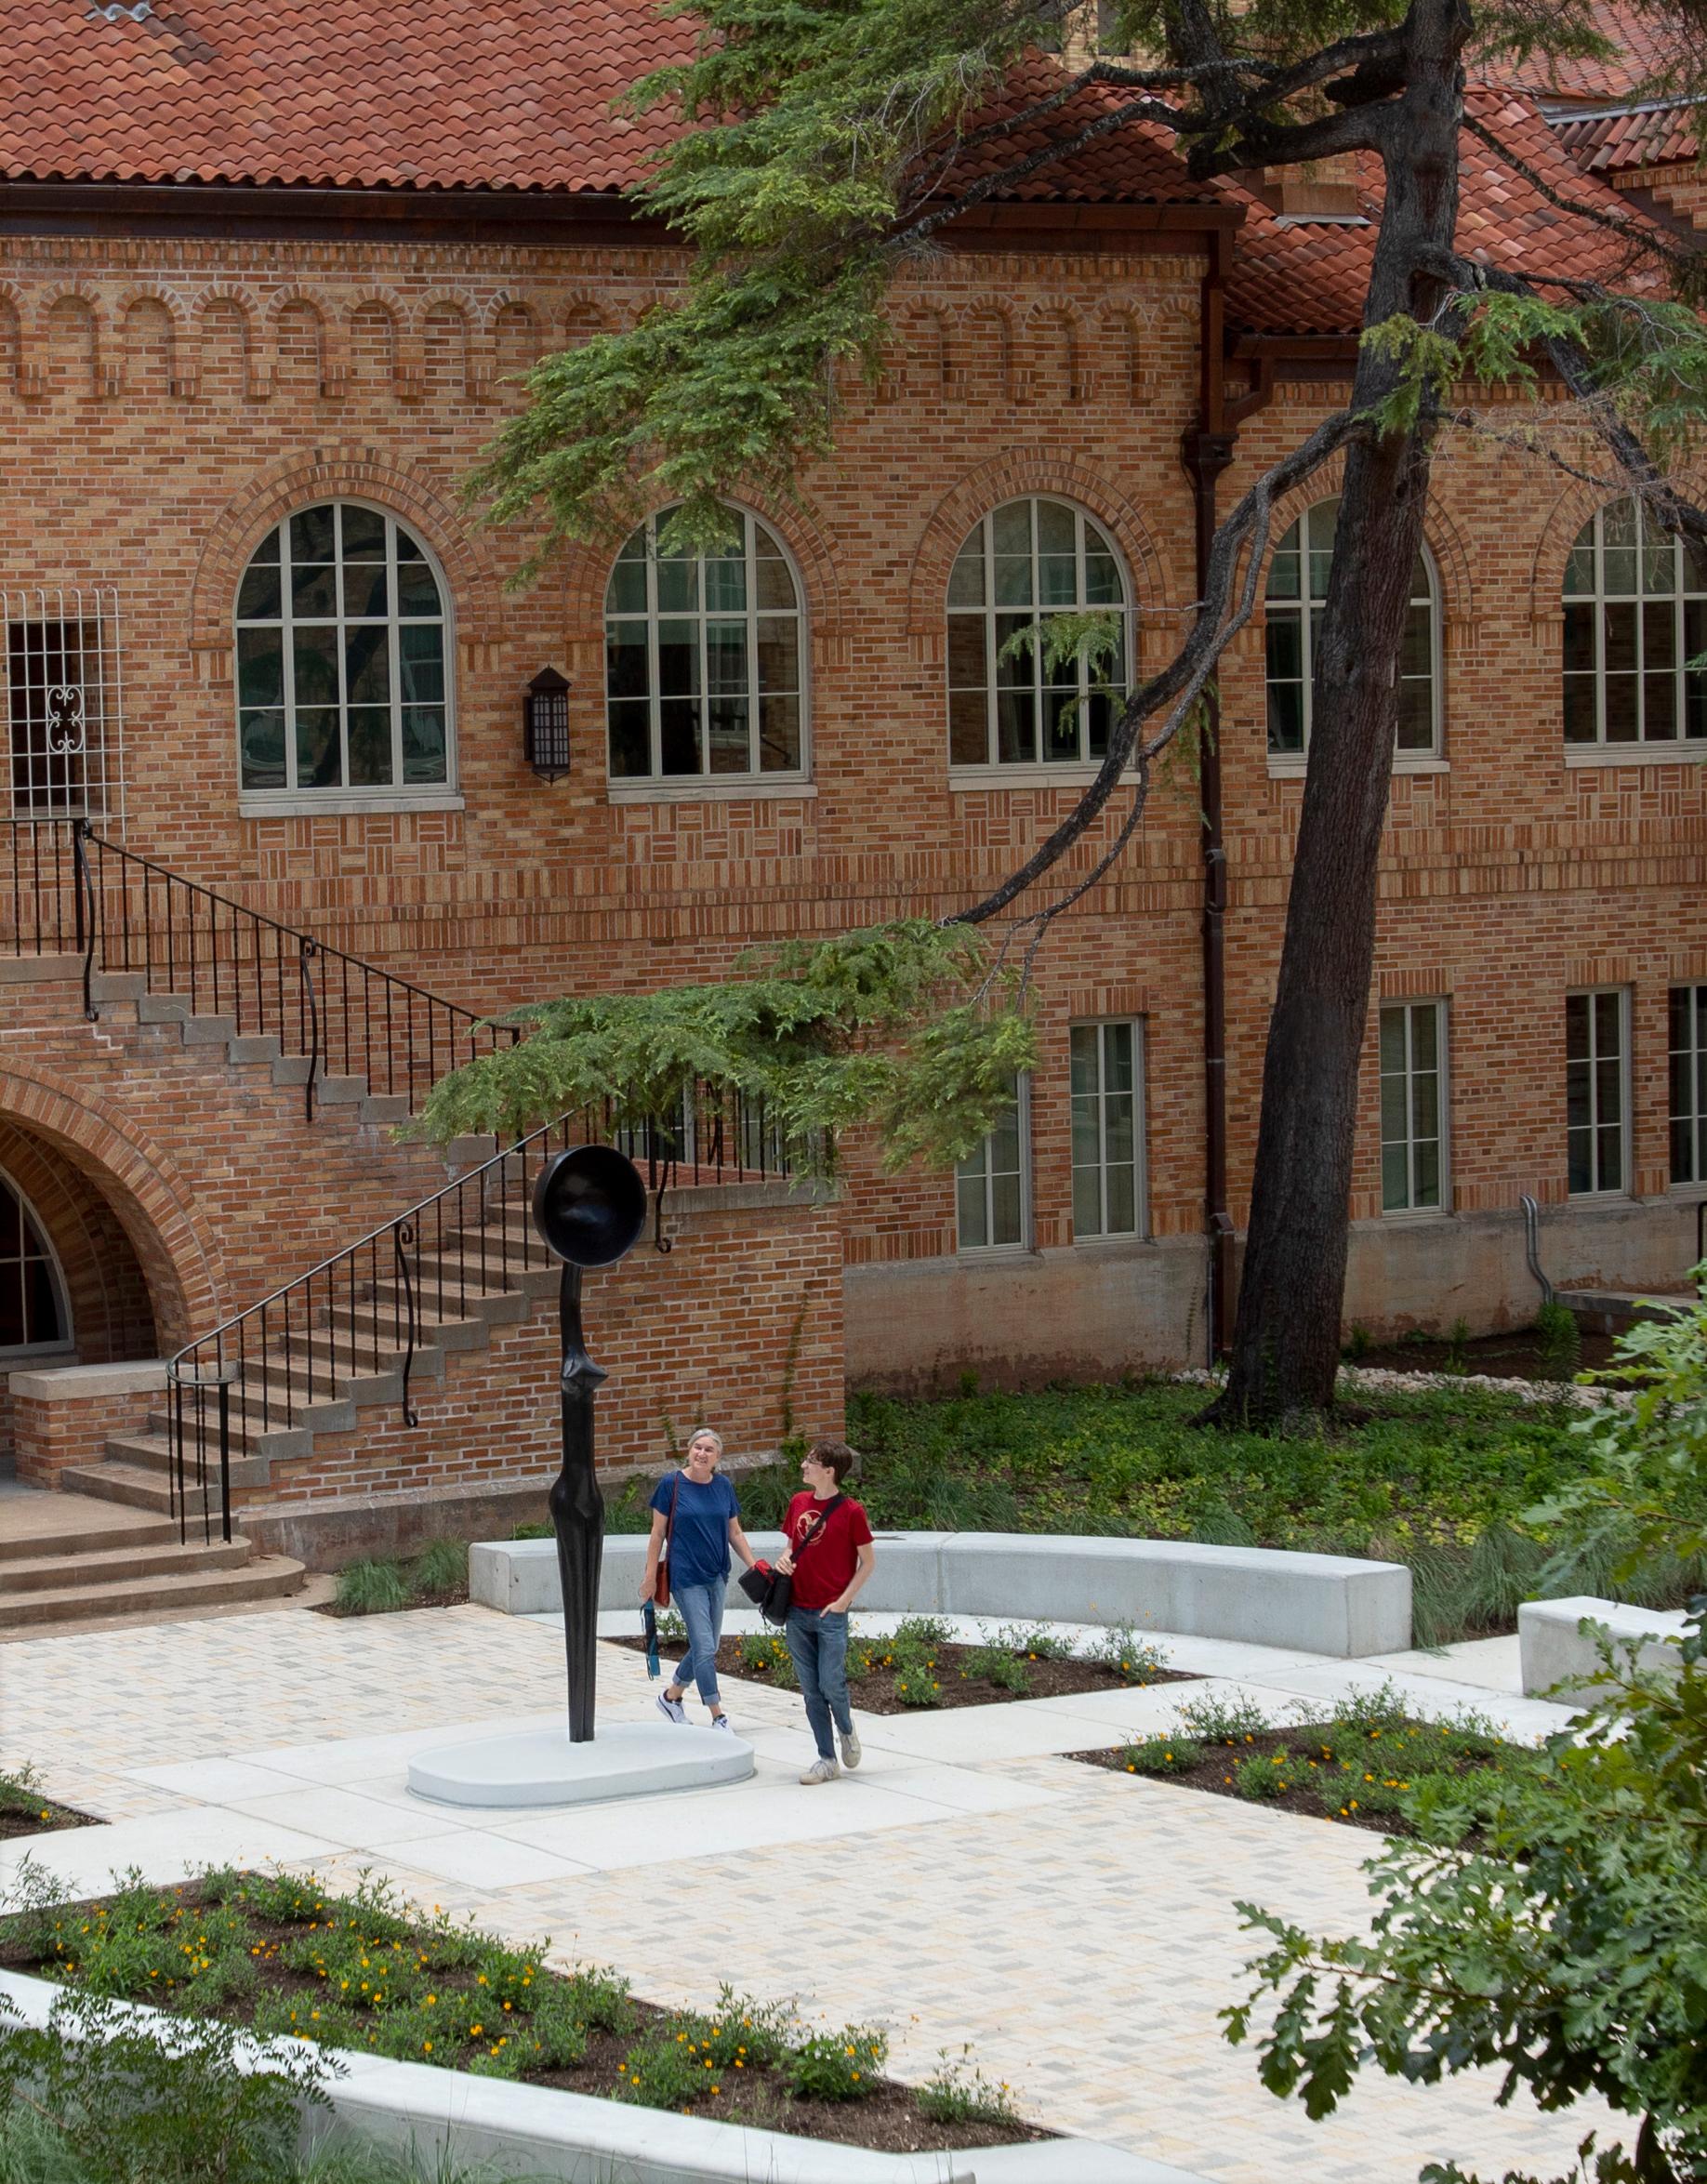 University of Texas Landmarks - Represents leighs candidphoto croppededit